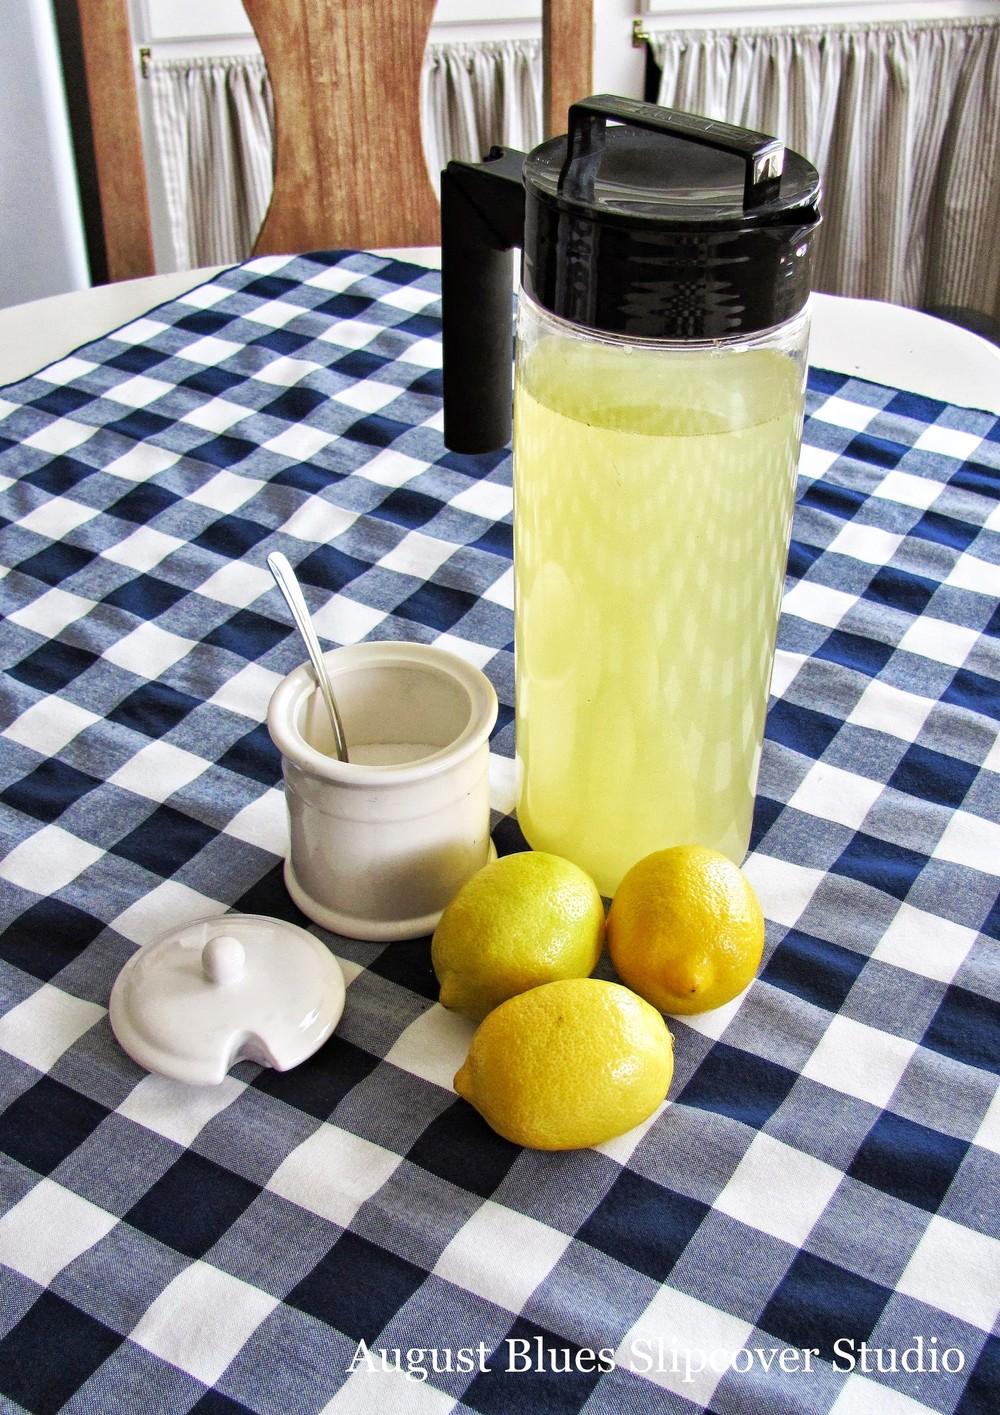 August Blues - Lemonade